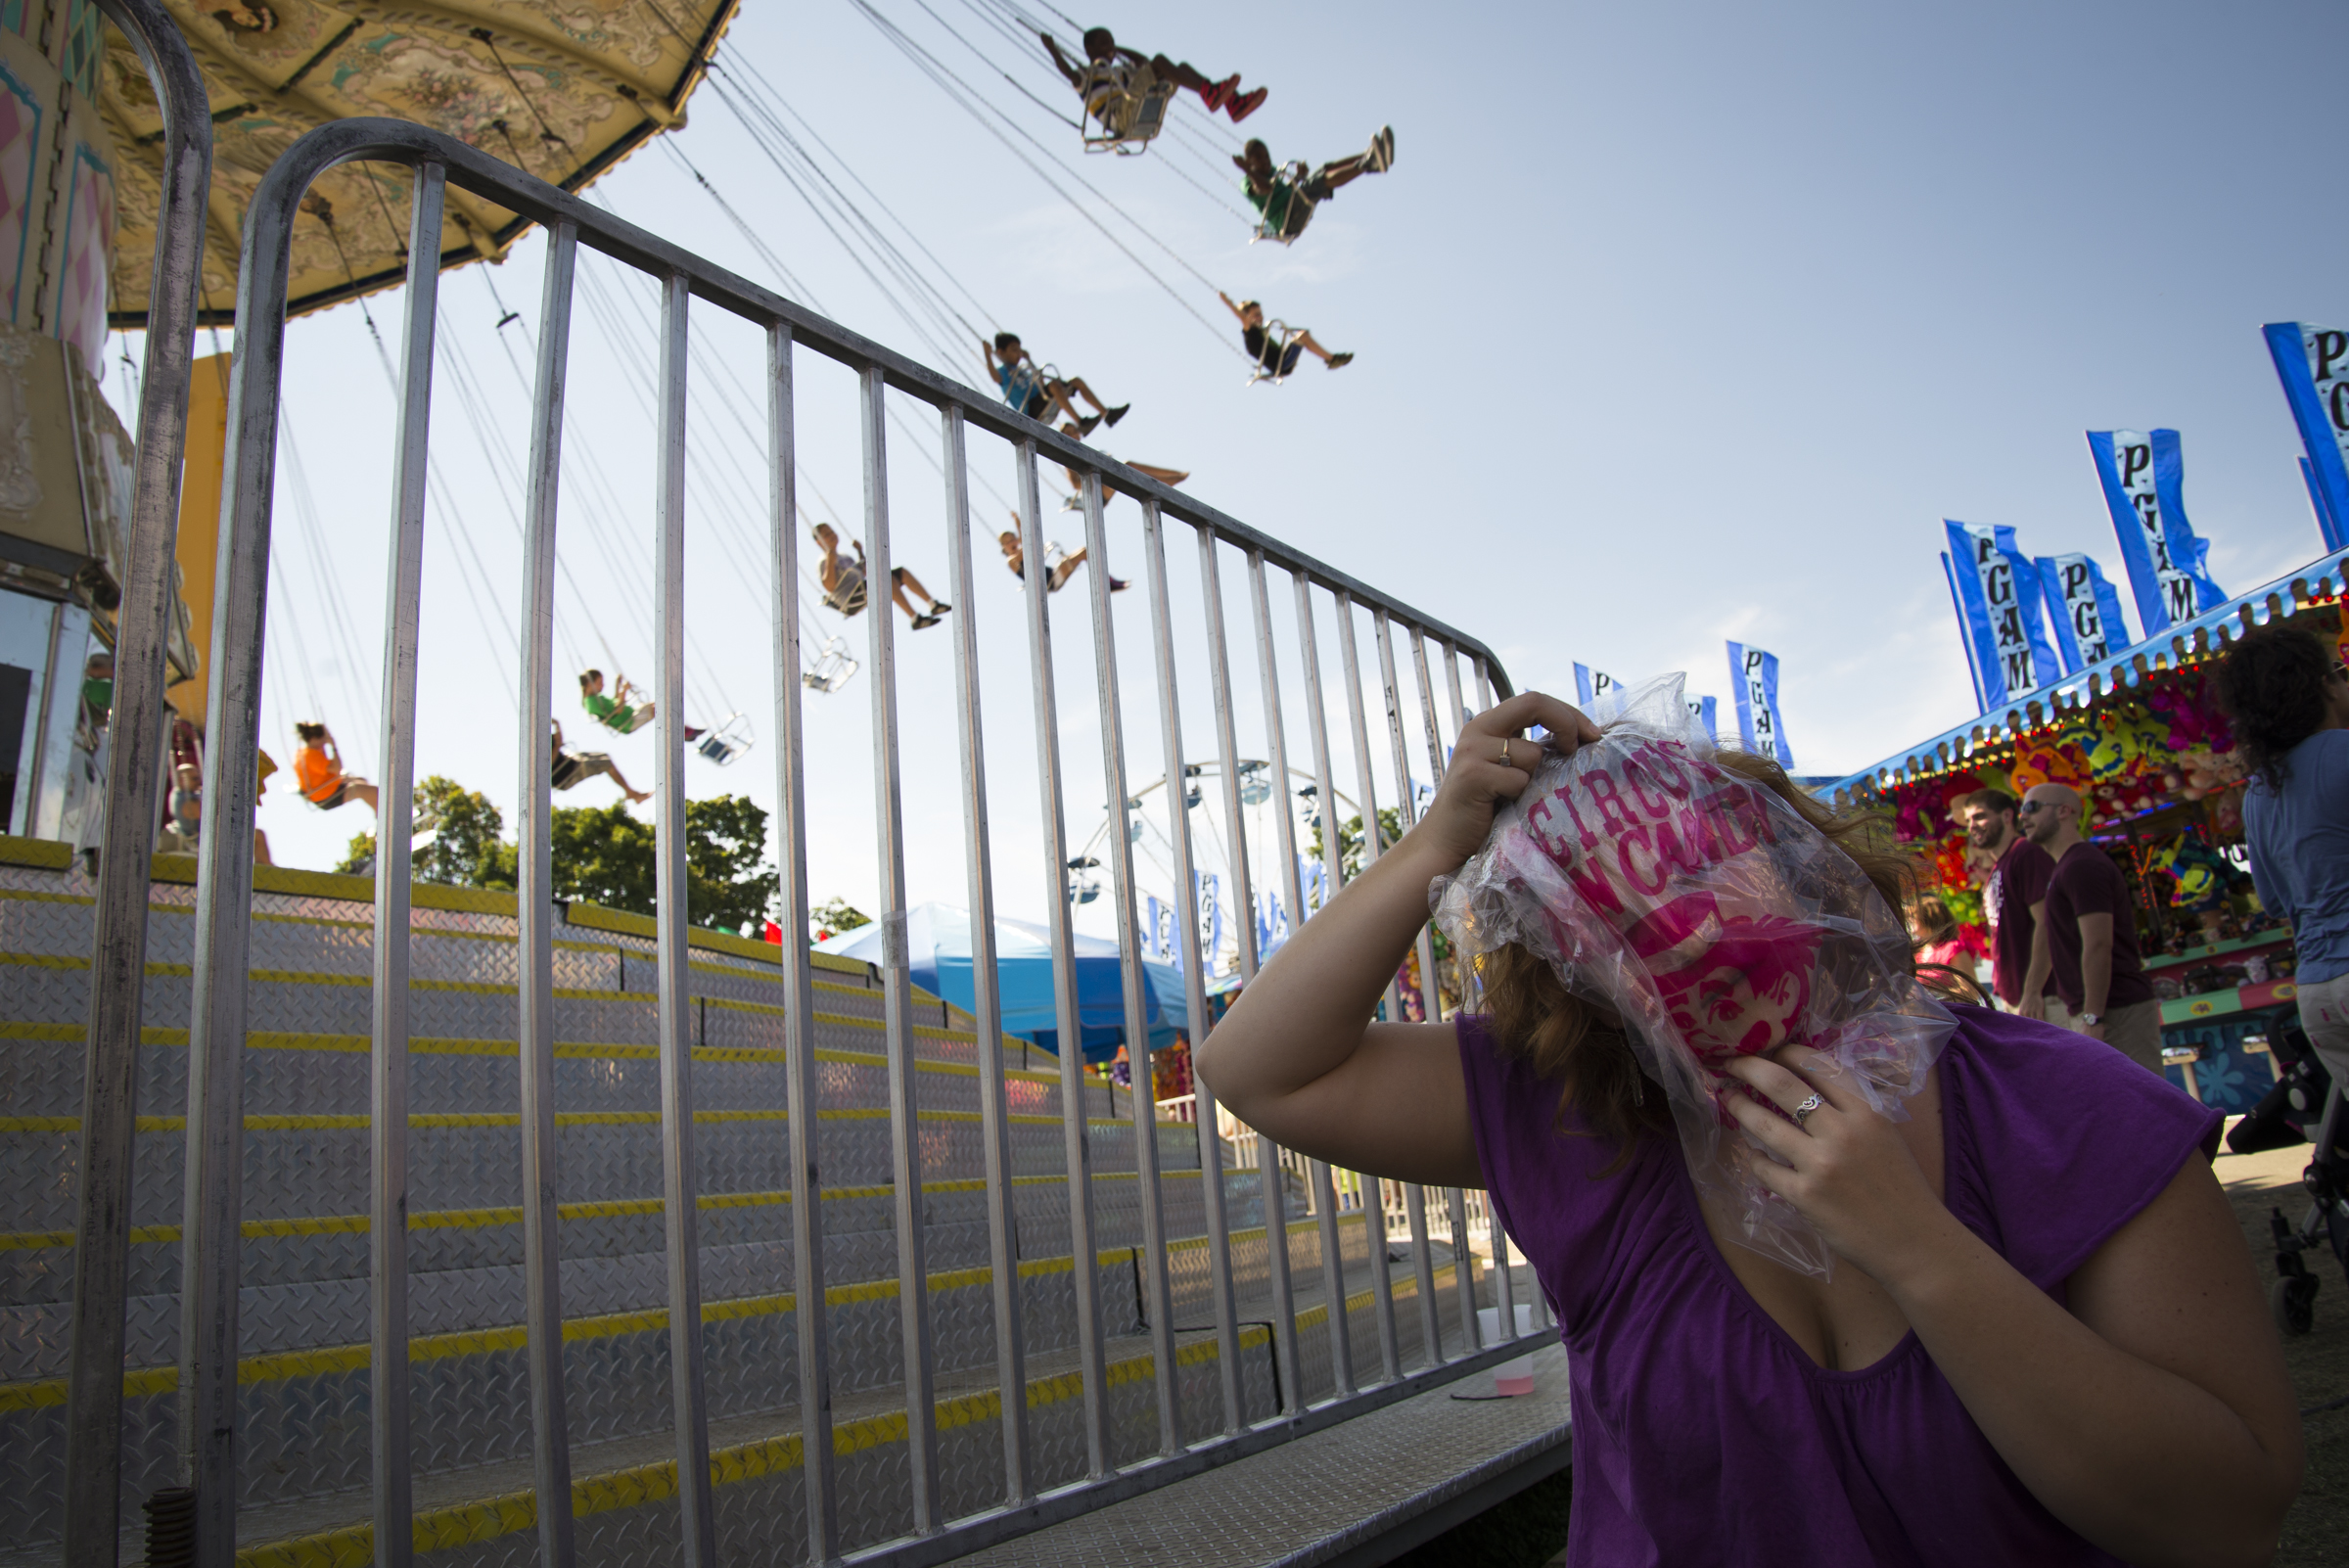 08252013-CarnivalScene-JuliaLuckettPhotography-10